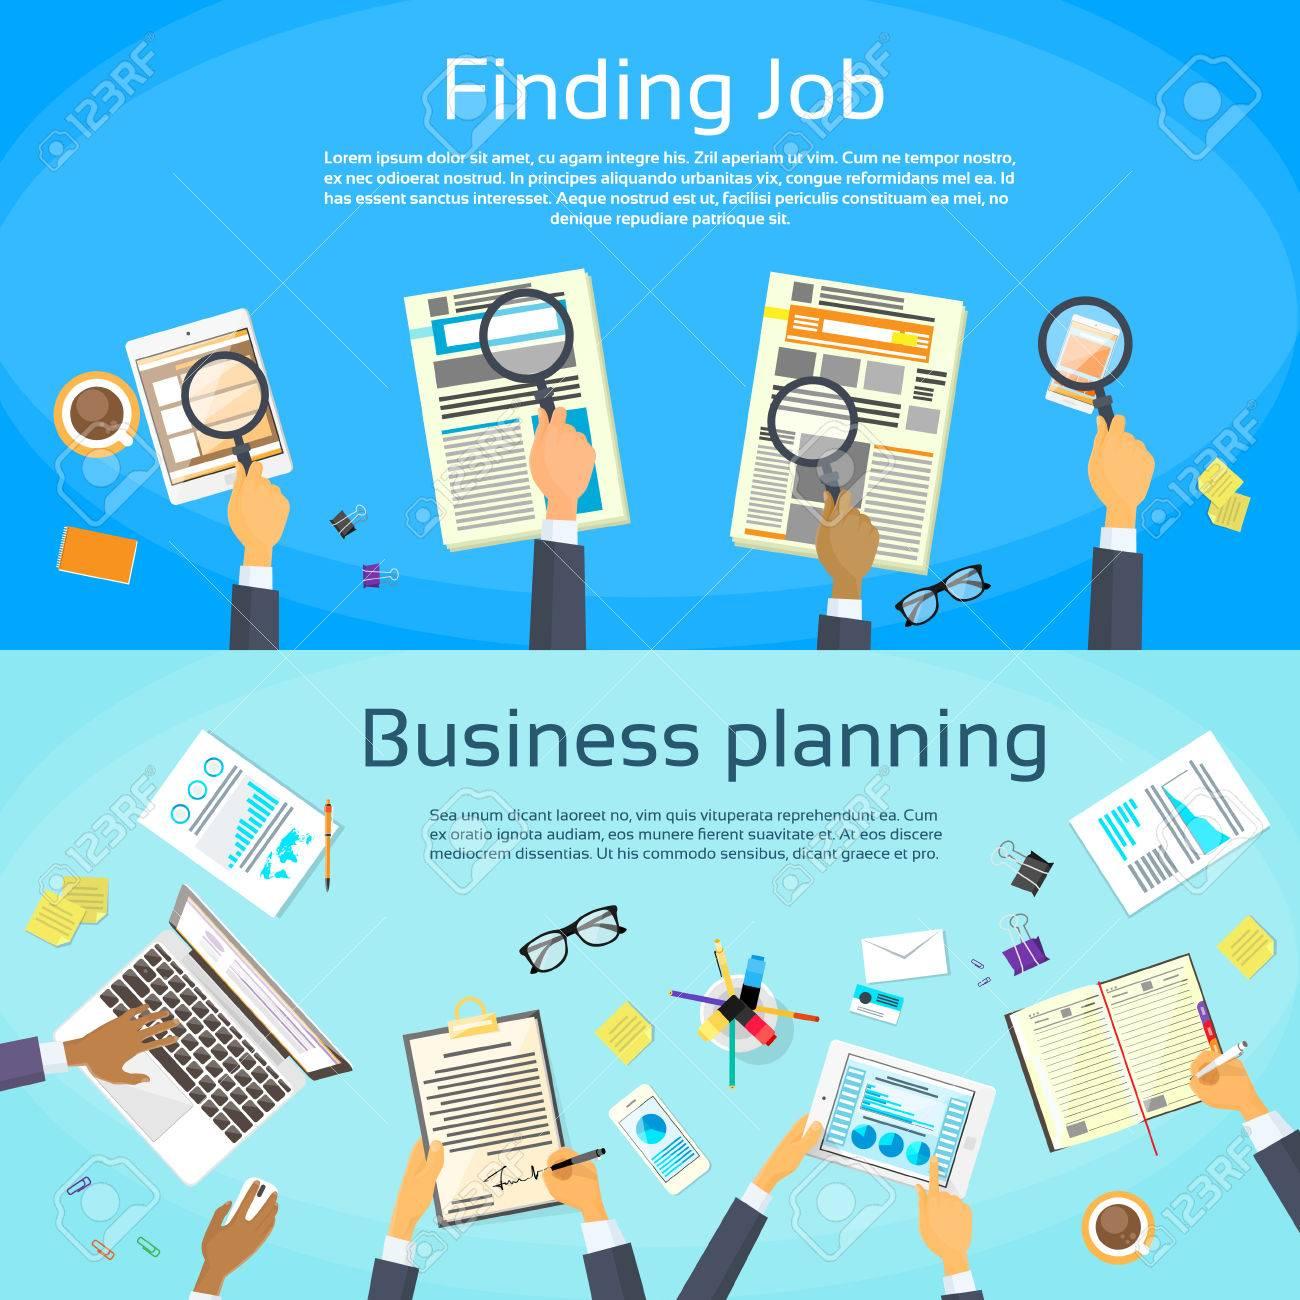 business planning searching job web banner flat vector business planning searching job web banner flat vector illustration stock vector 43917113